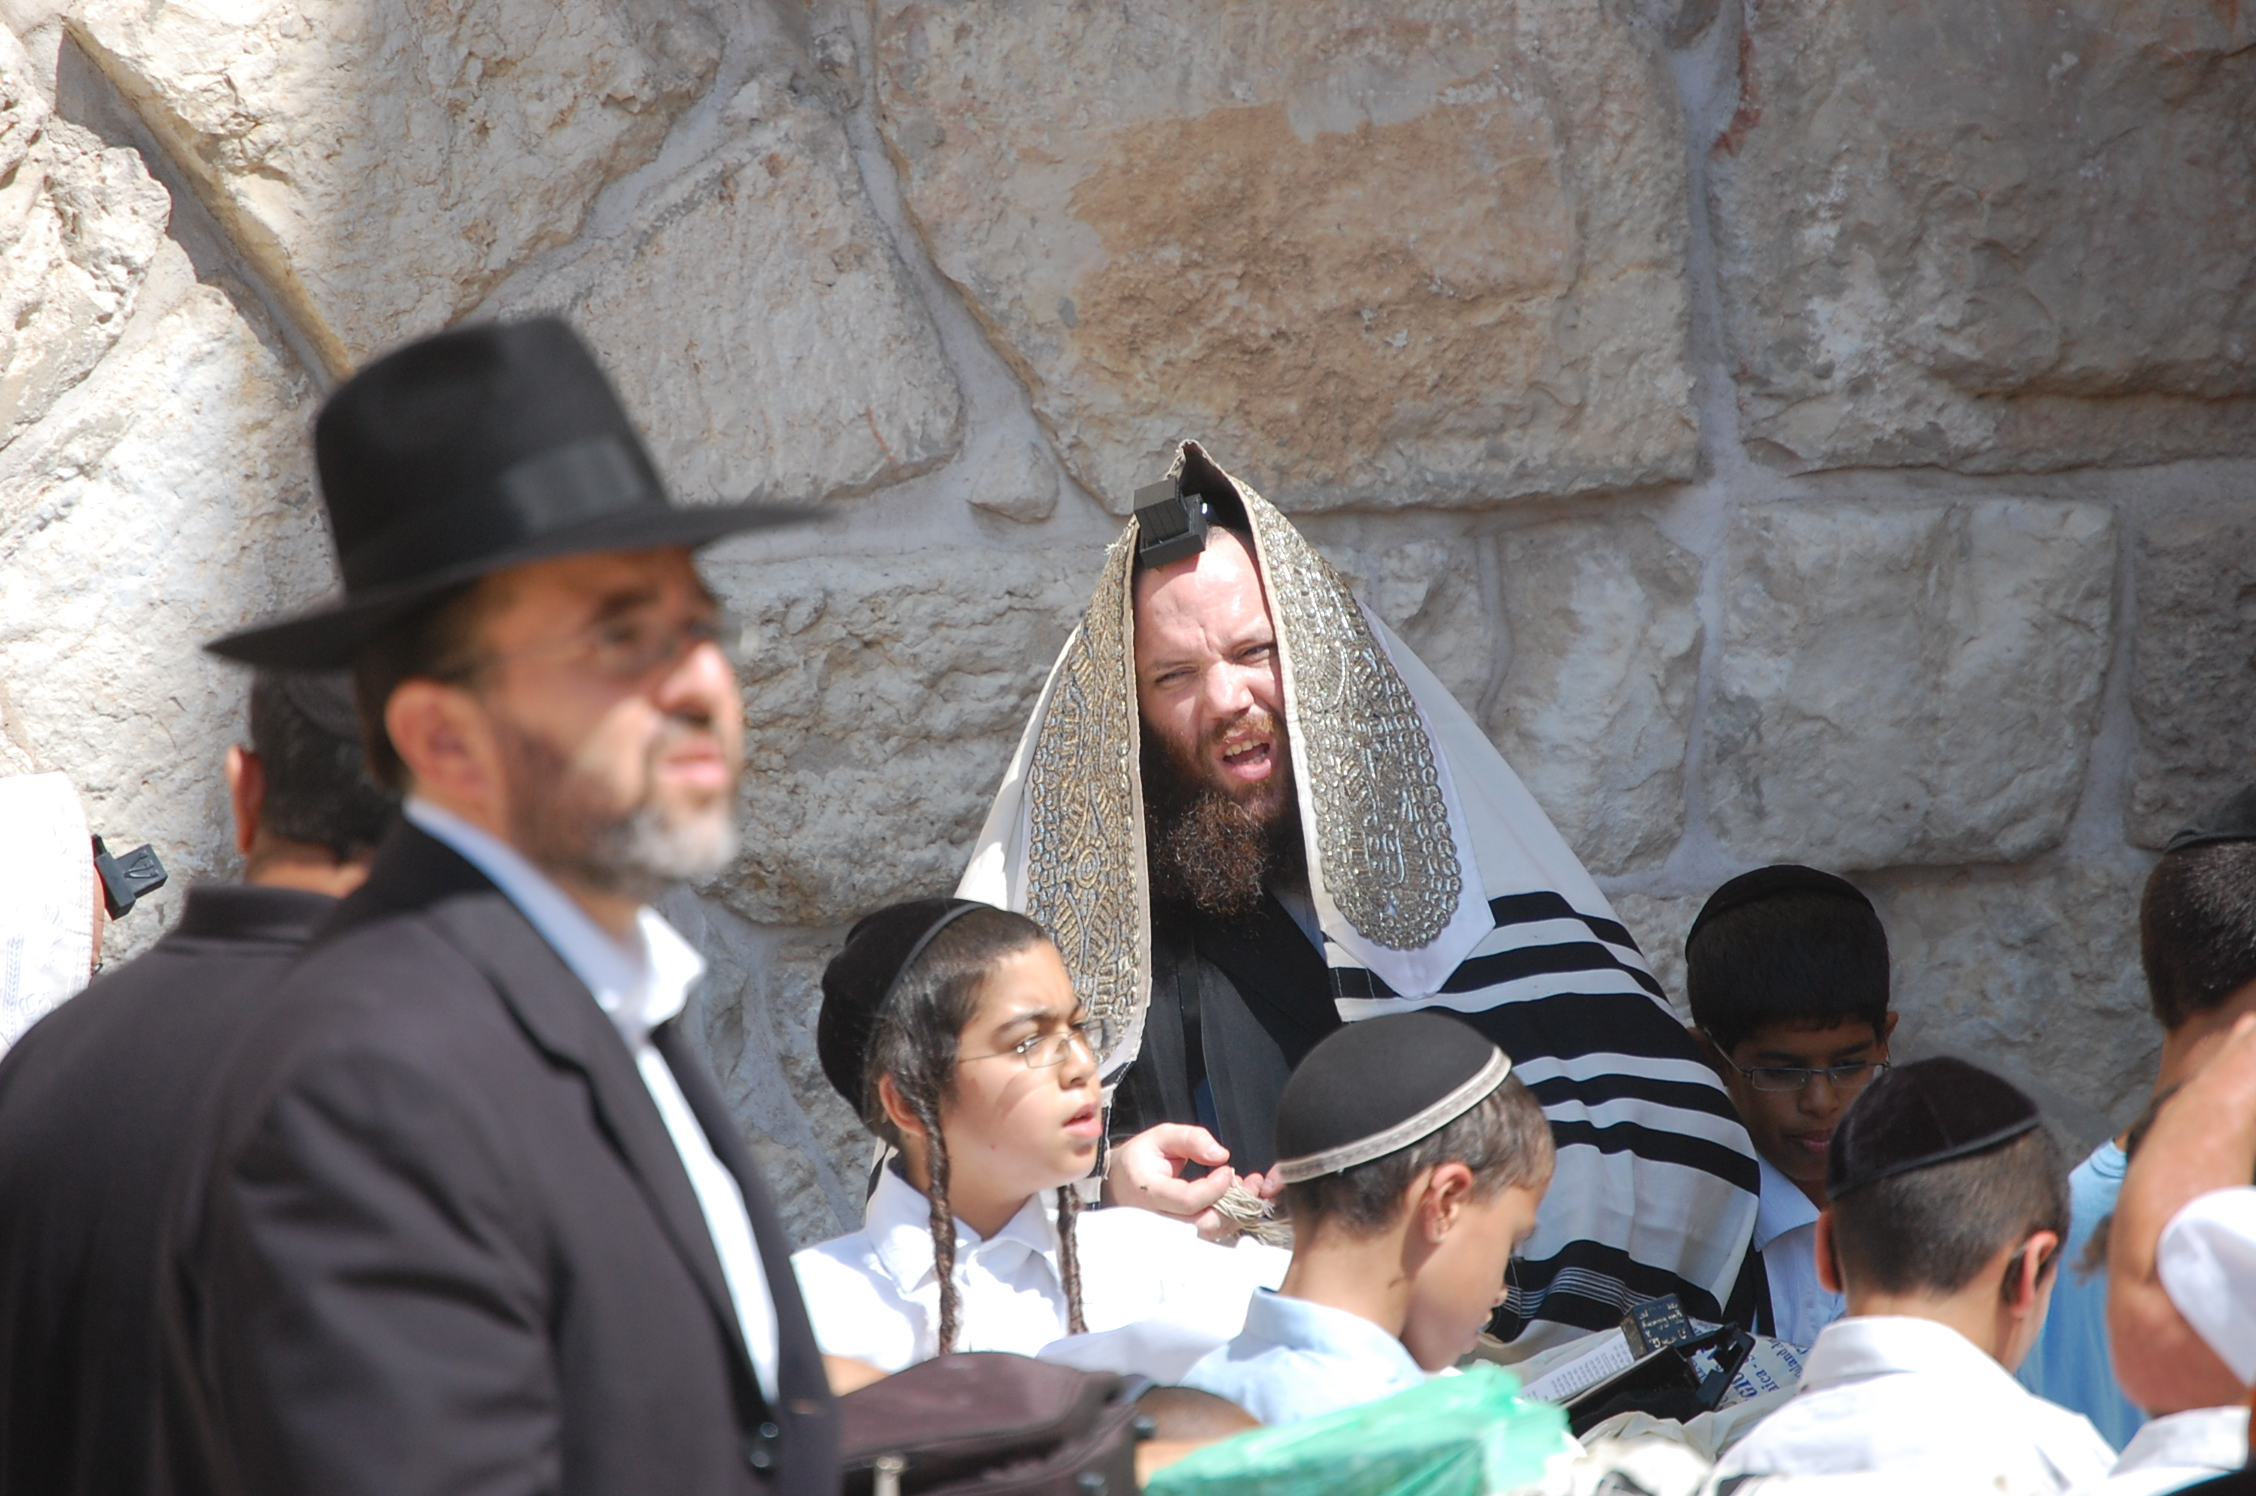 Prayers at the Western Wall in Jerusalem, Israel